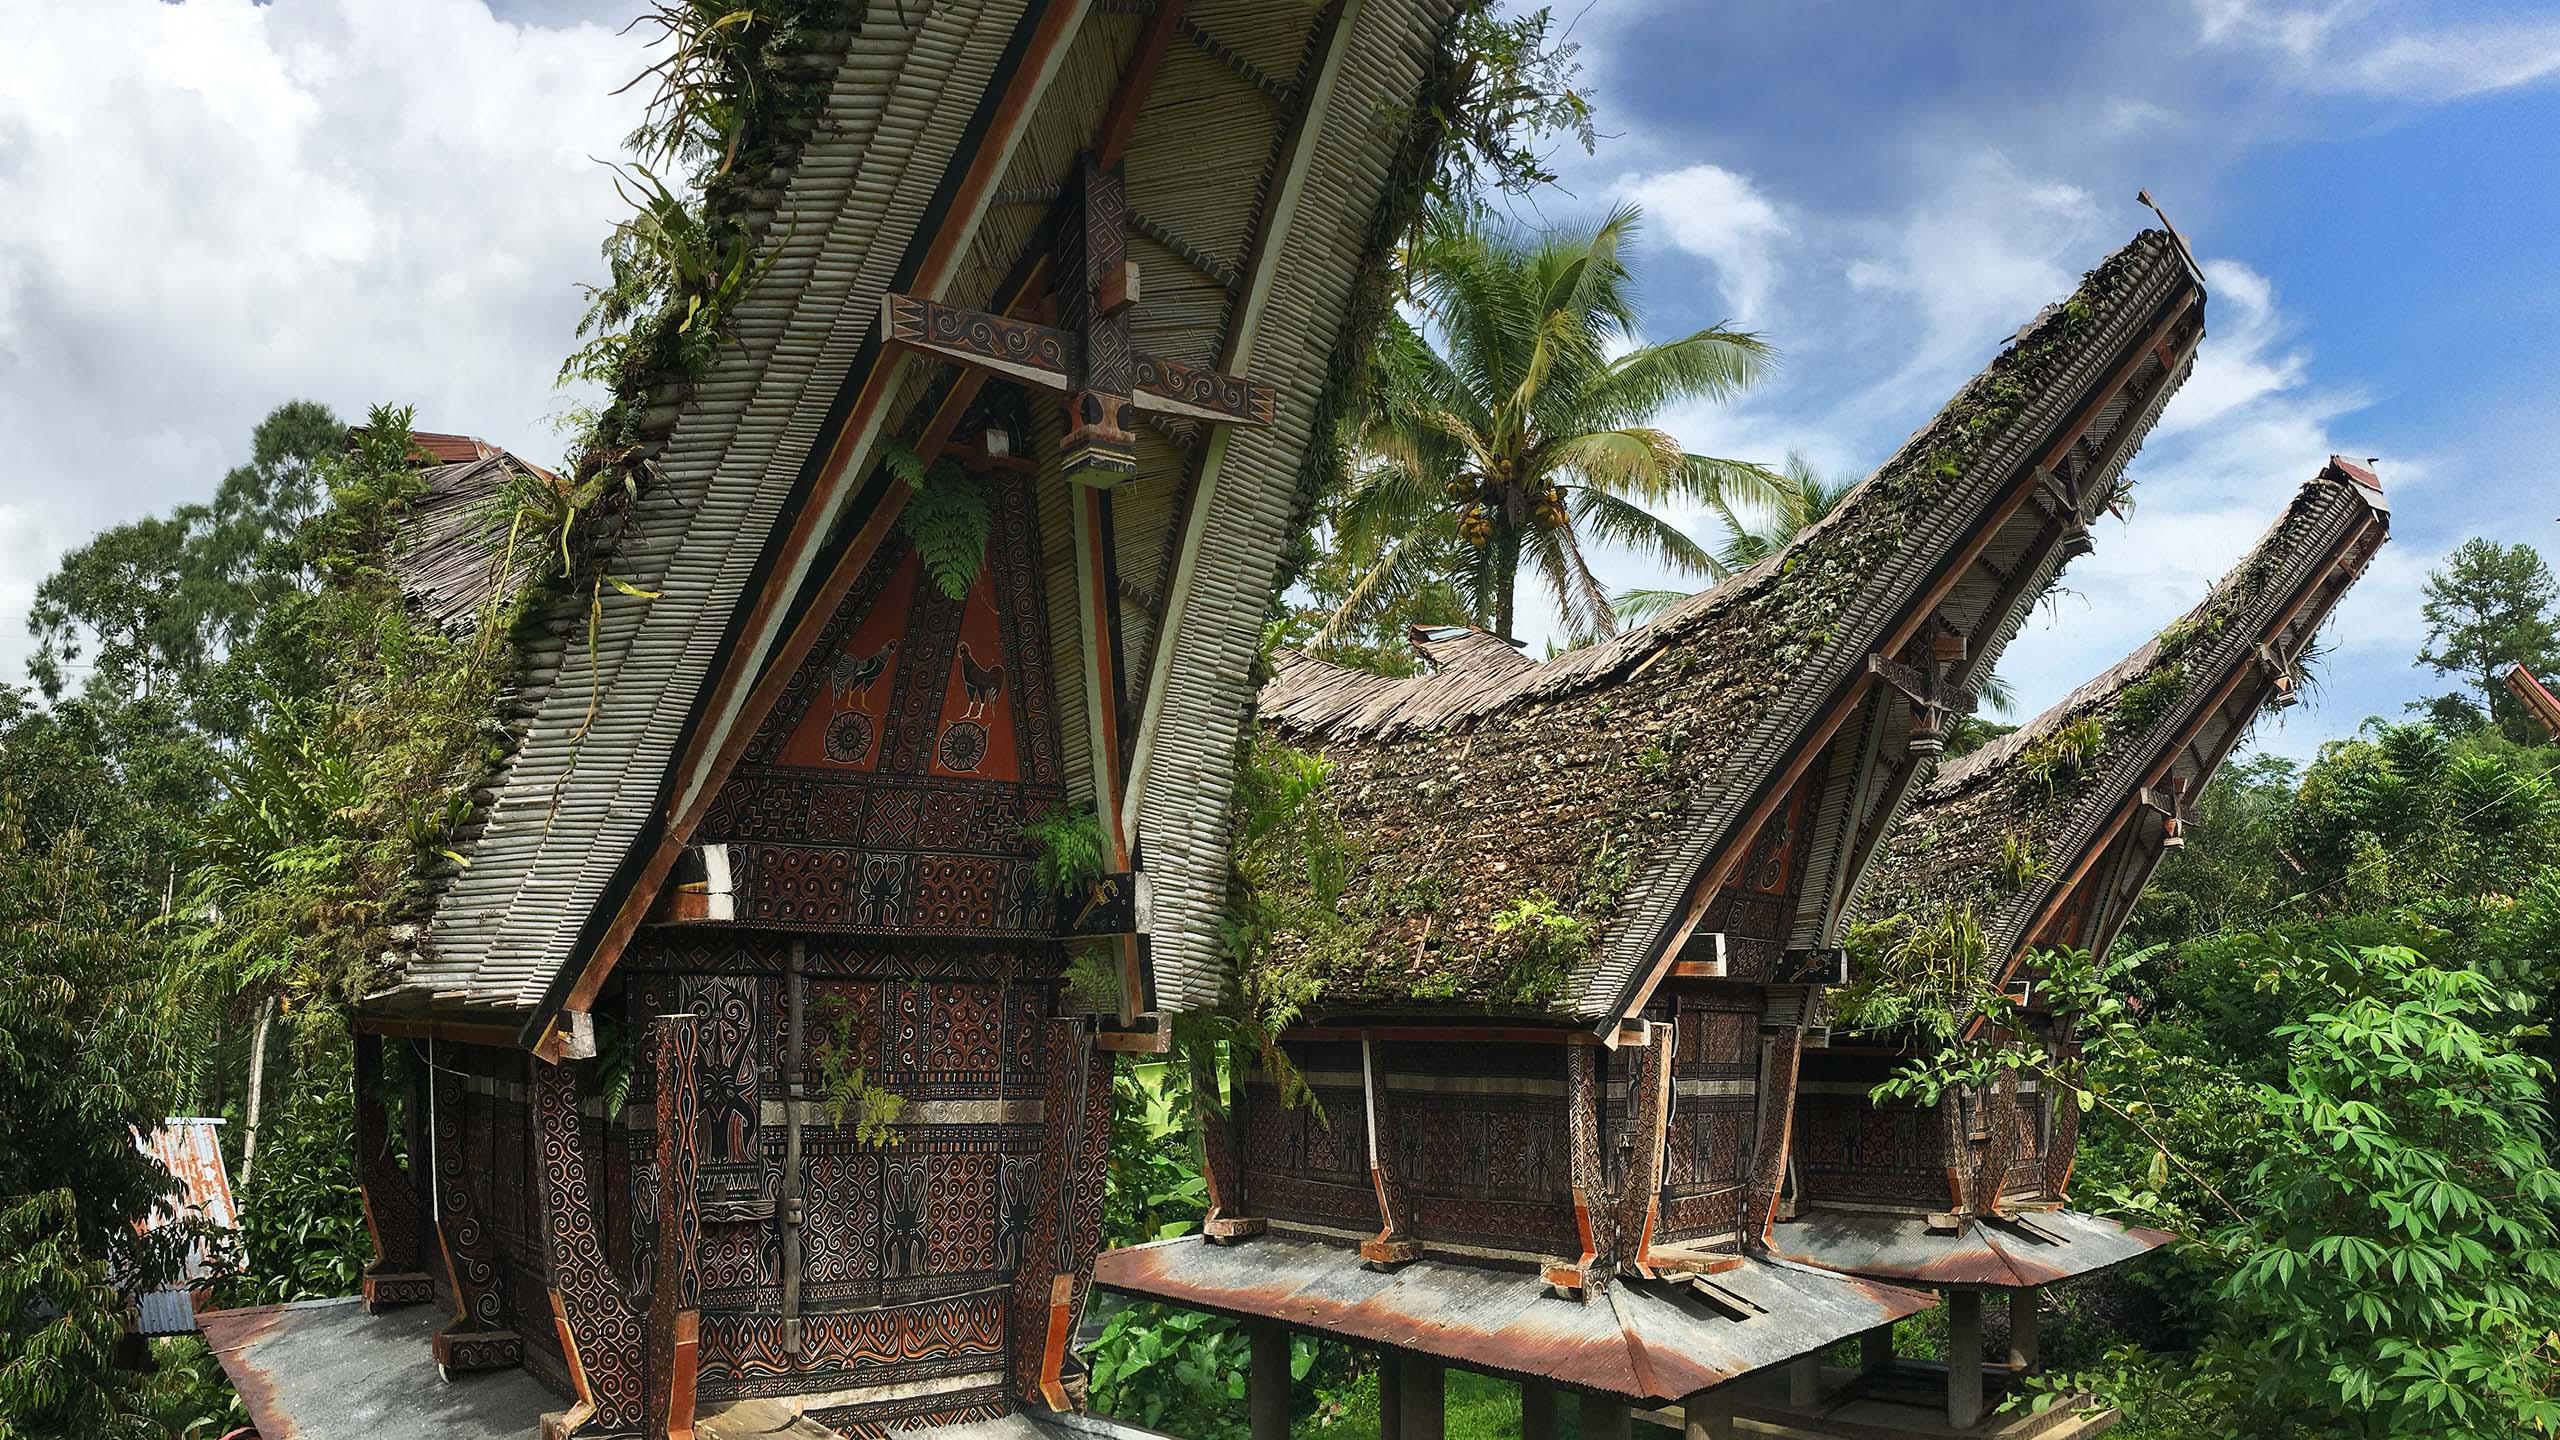 Mandara toraja éco-tourisme indonésie